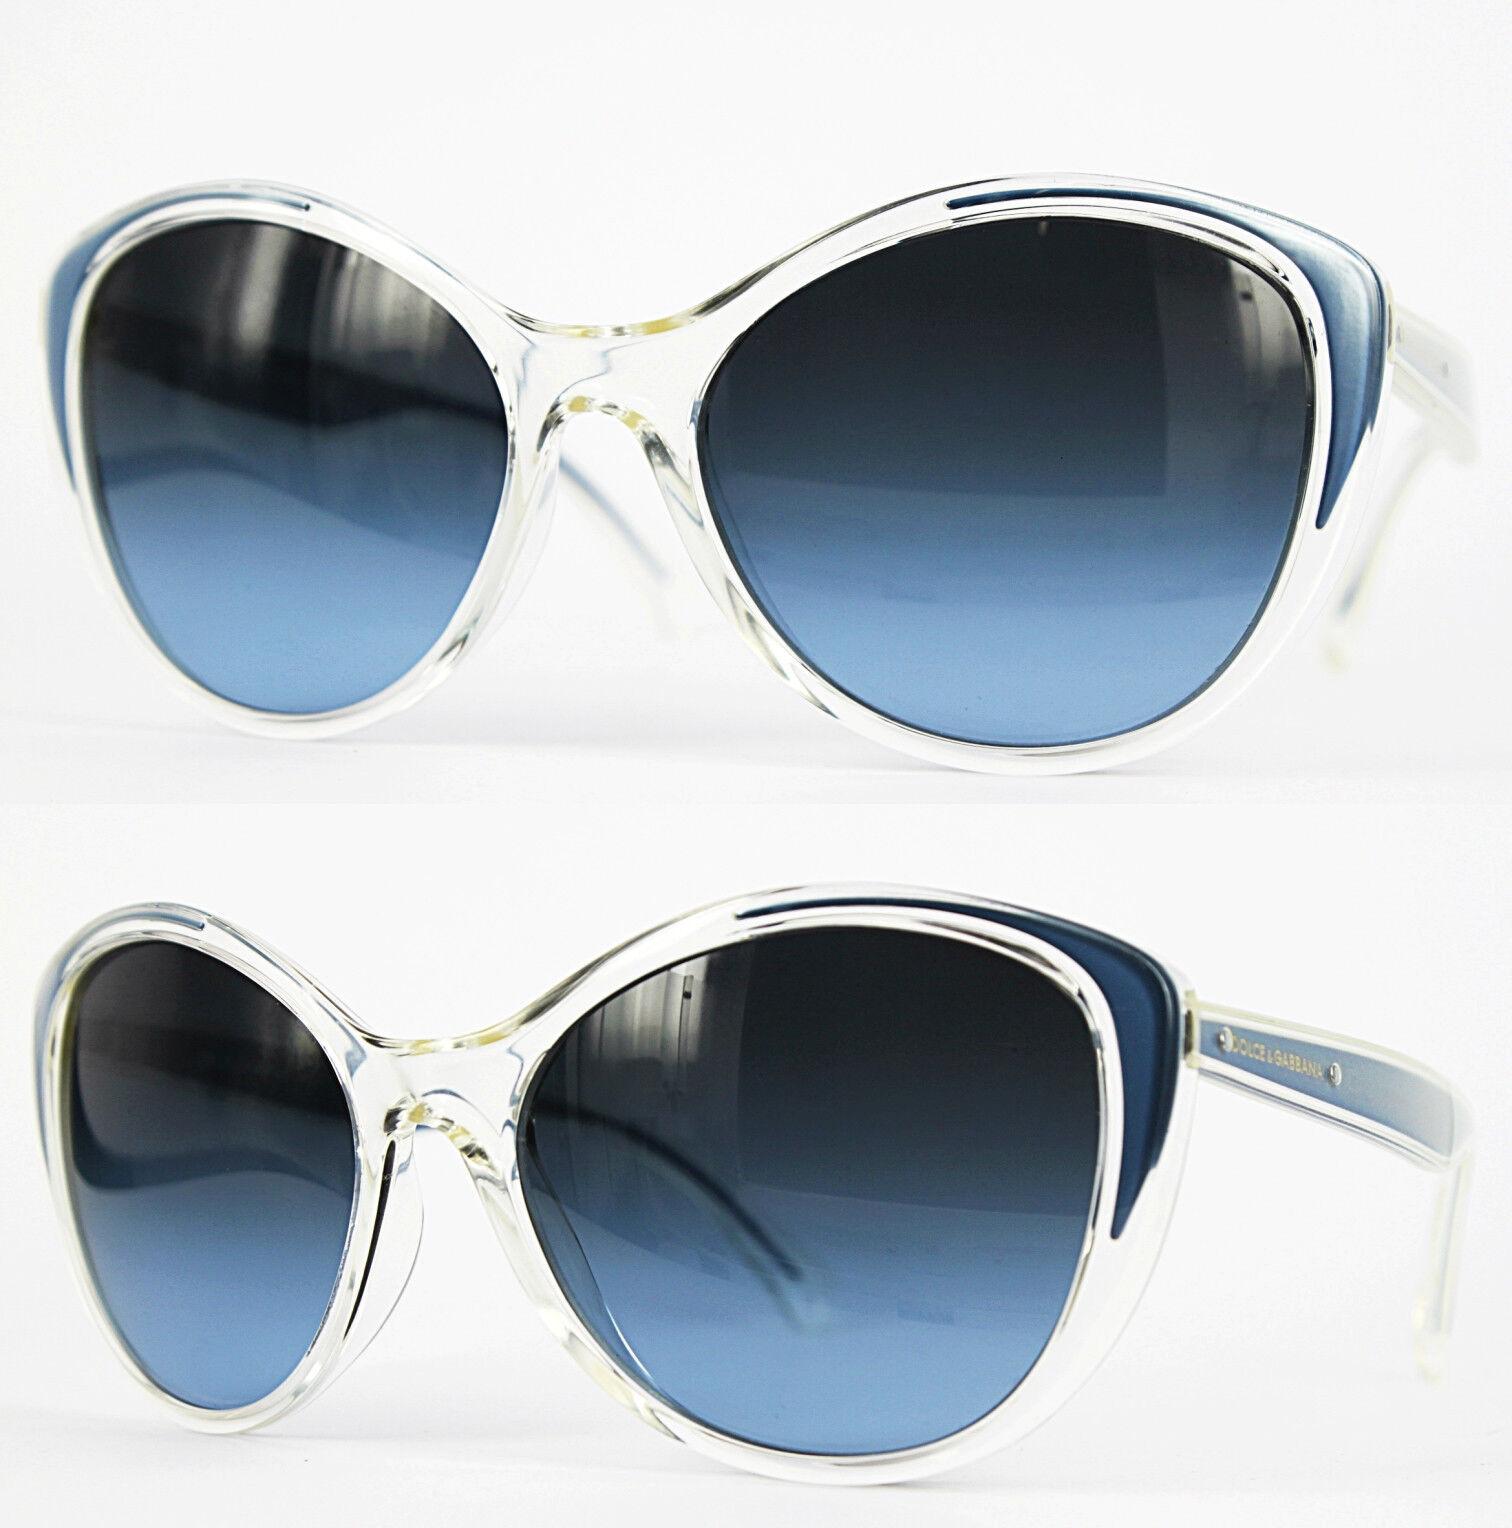 Lunettes de soleil Vogue Eyewear VO2845S Black /18/140. IZMSkN